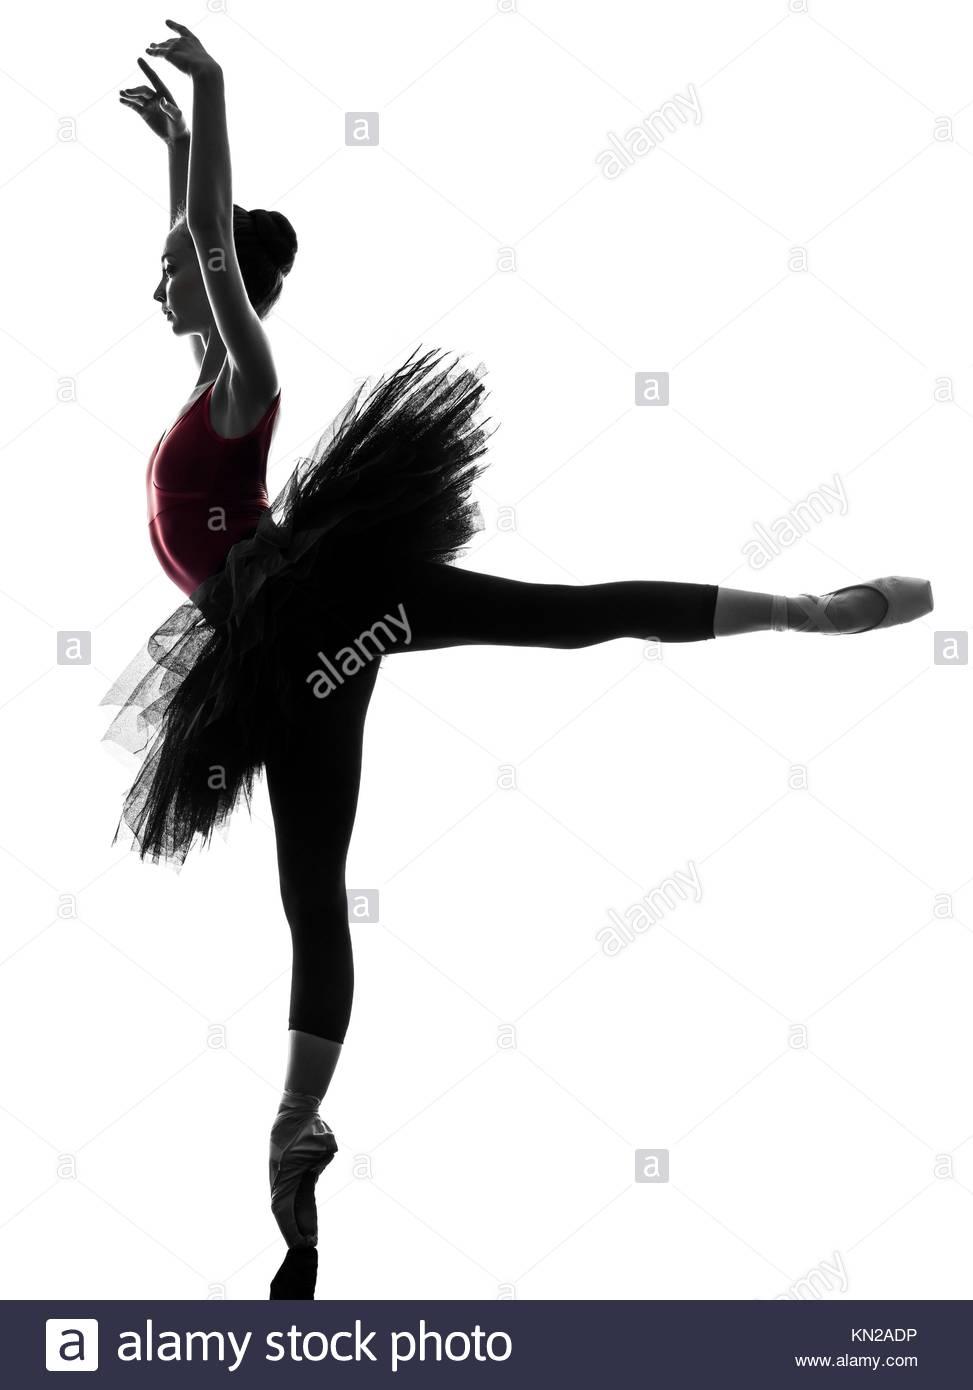 973x1390 One Caucasian Young Woman Ballerina Ballet Dancer Dancing